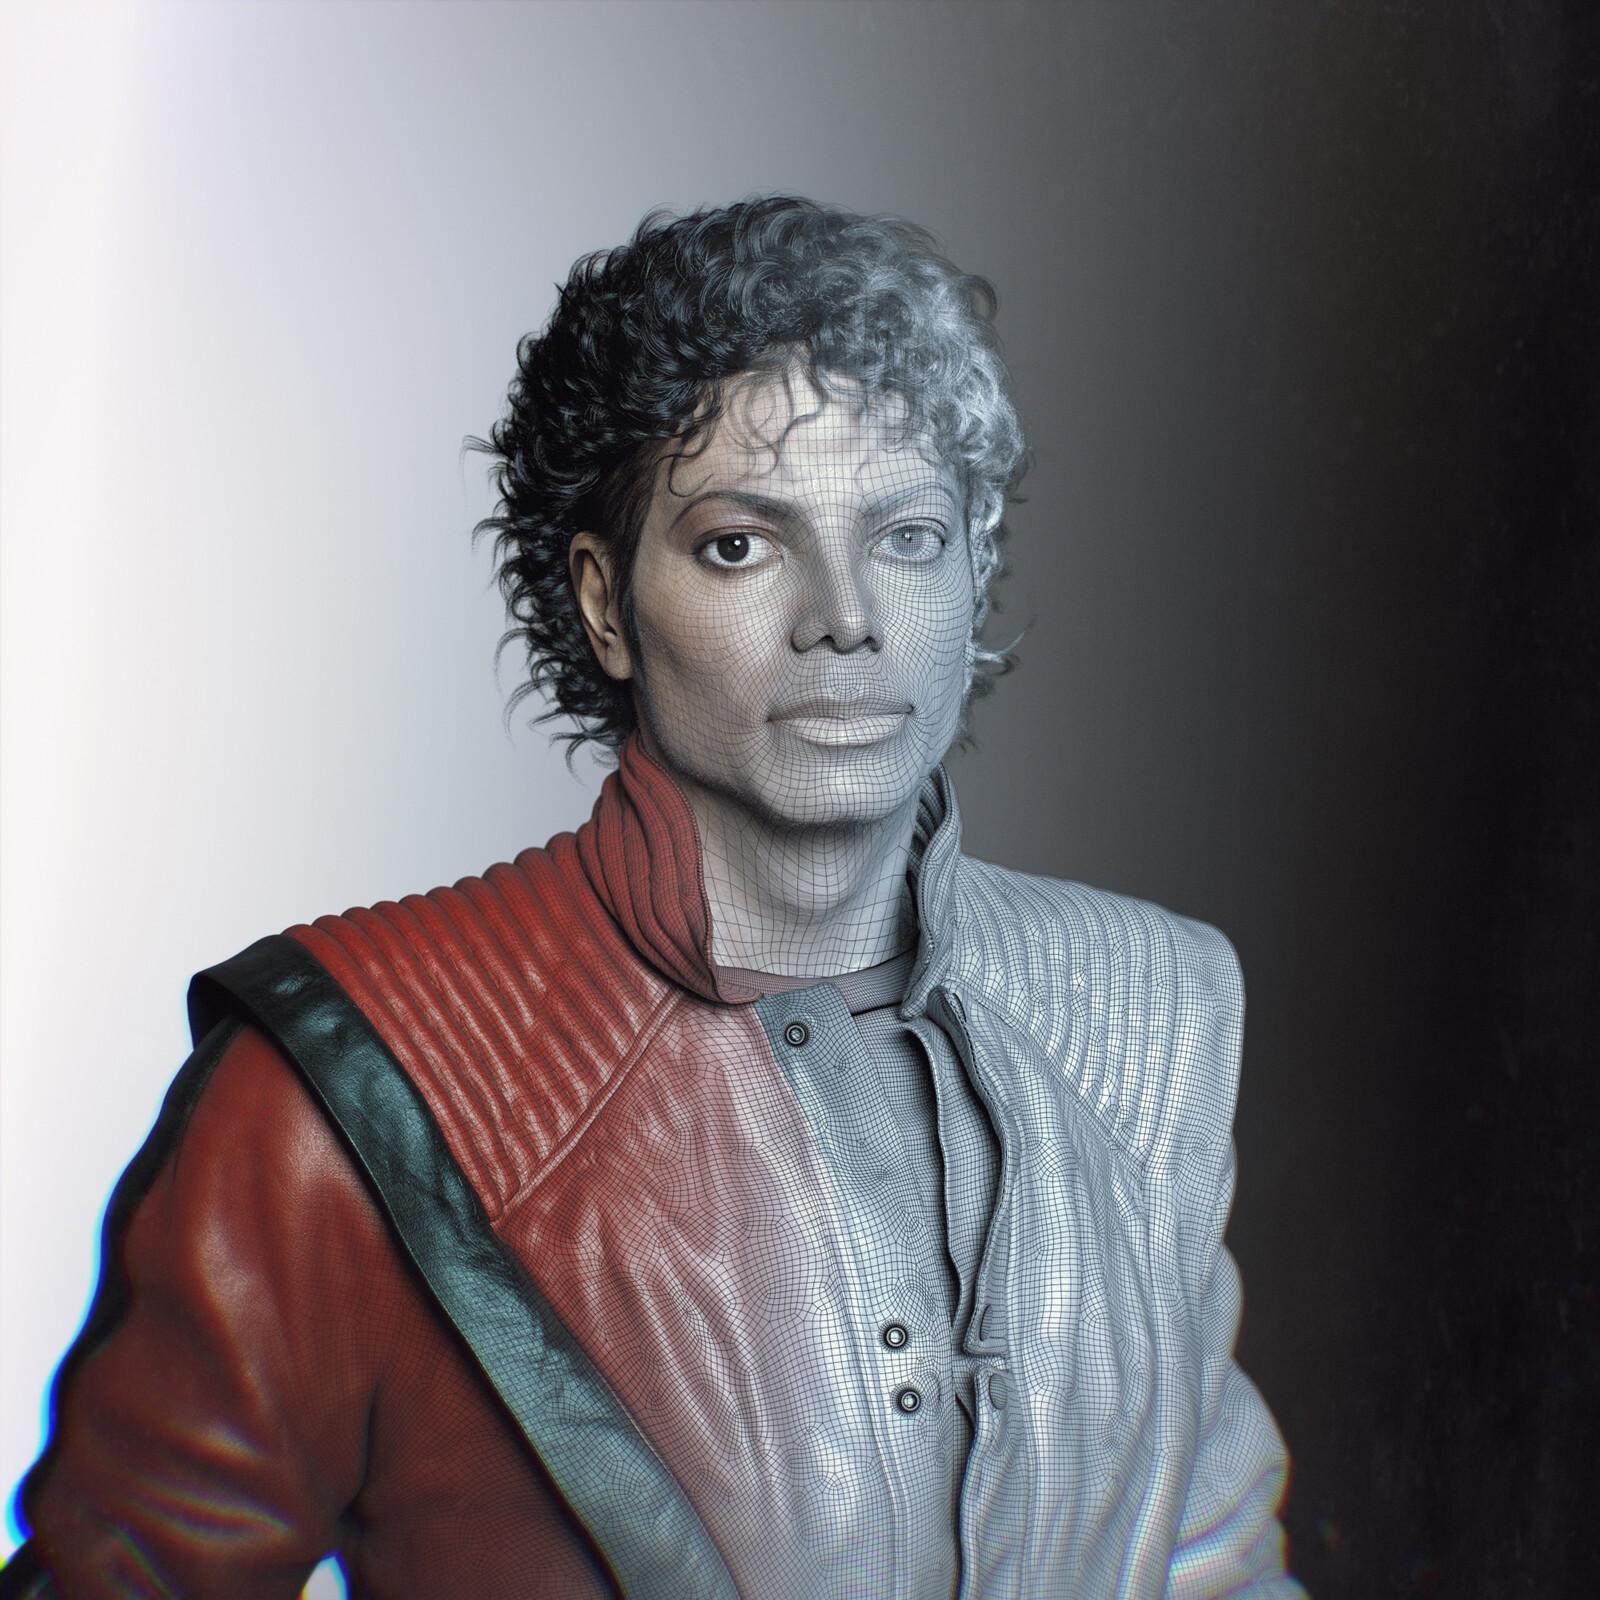 hadi karimi michael jackson 3d portrait